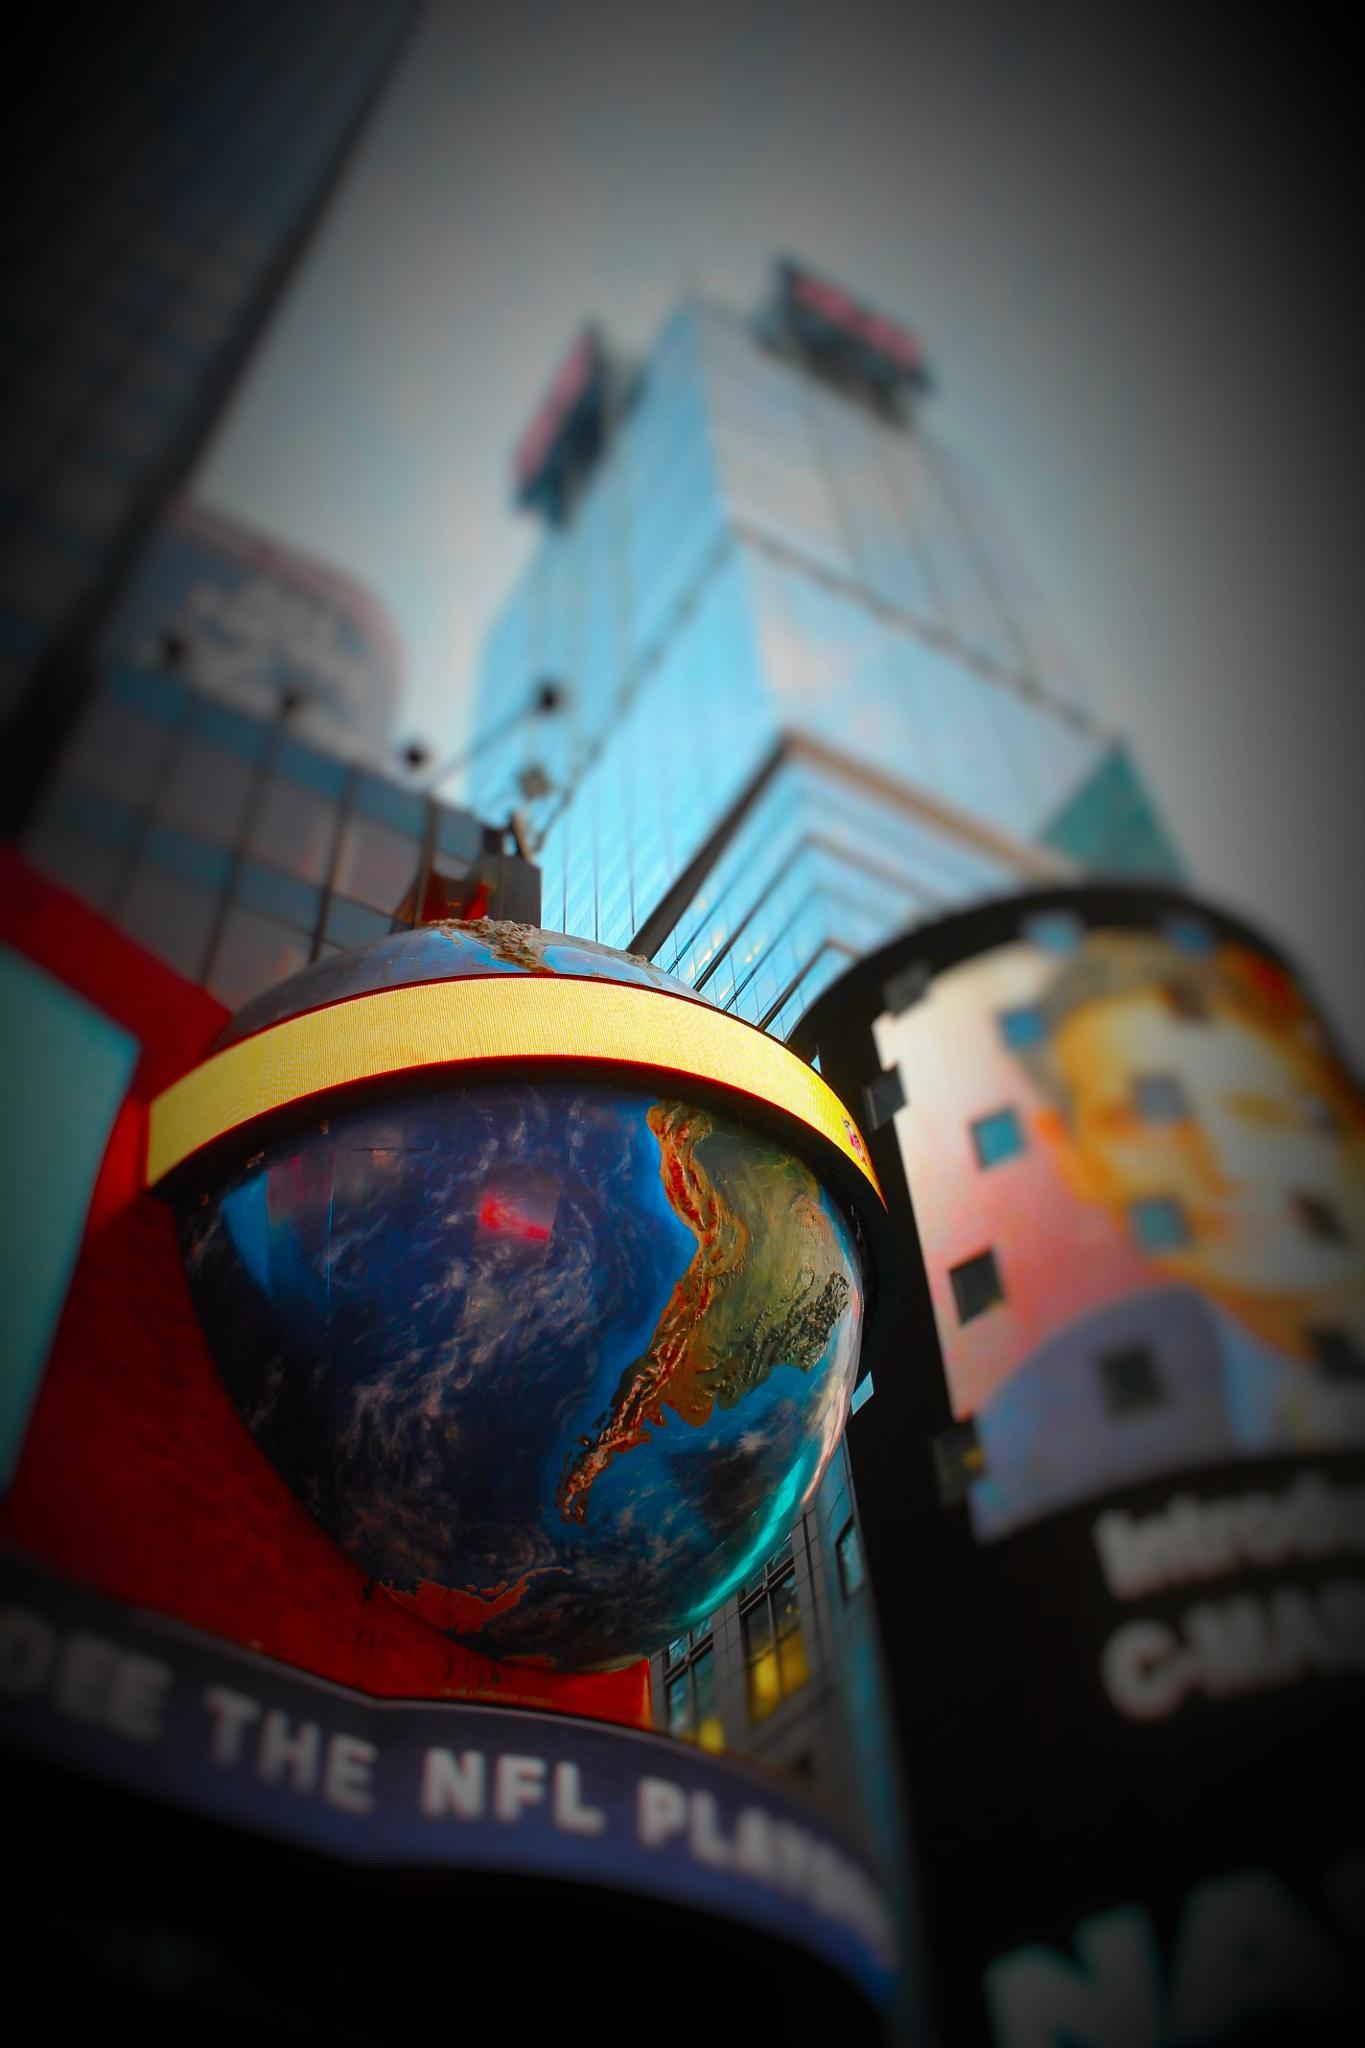 Planet World on Times Square, by Liborio Drogo